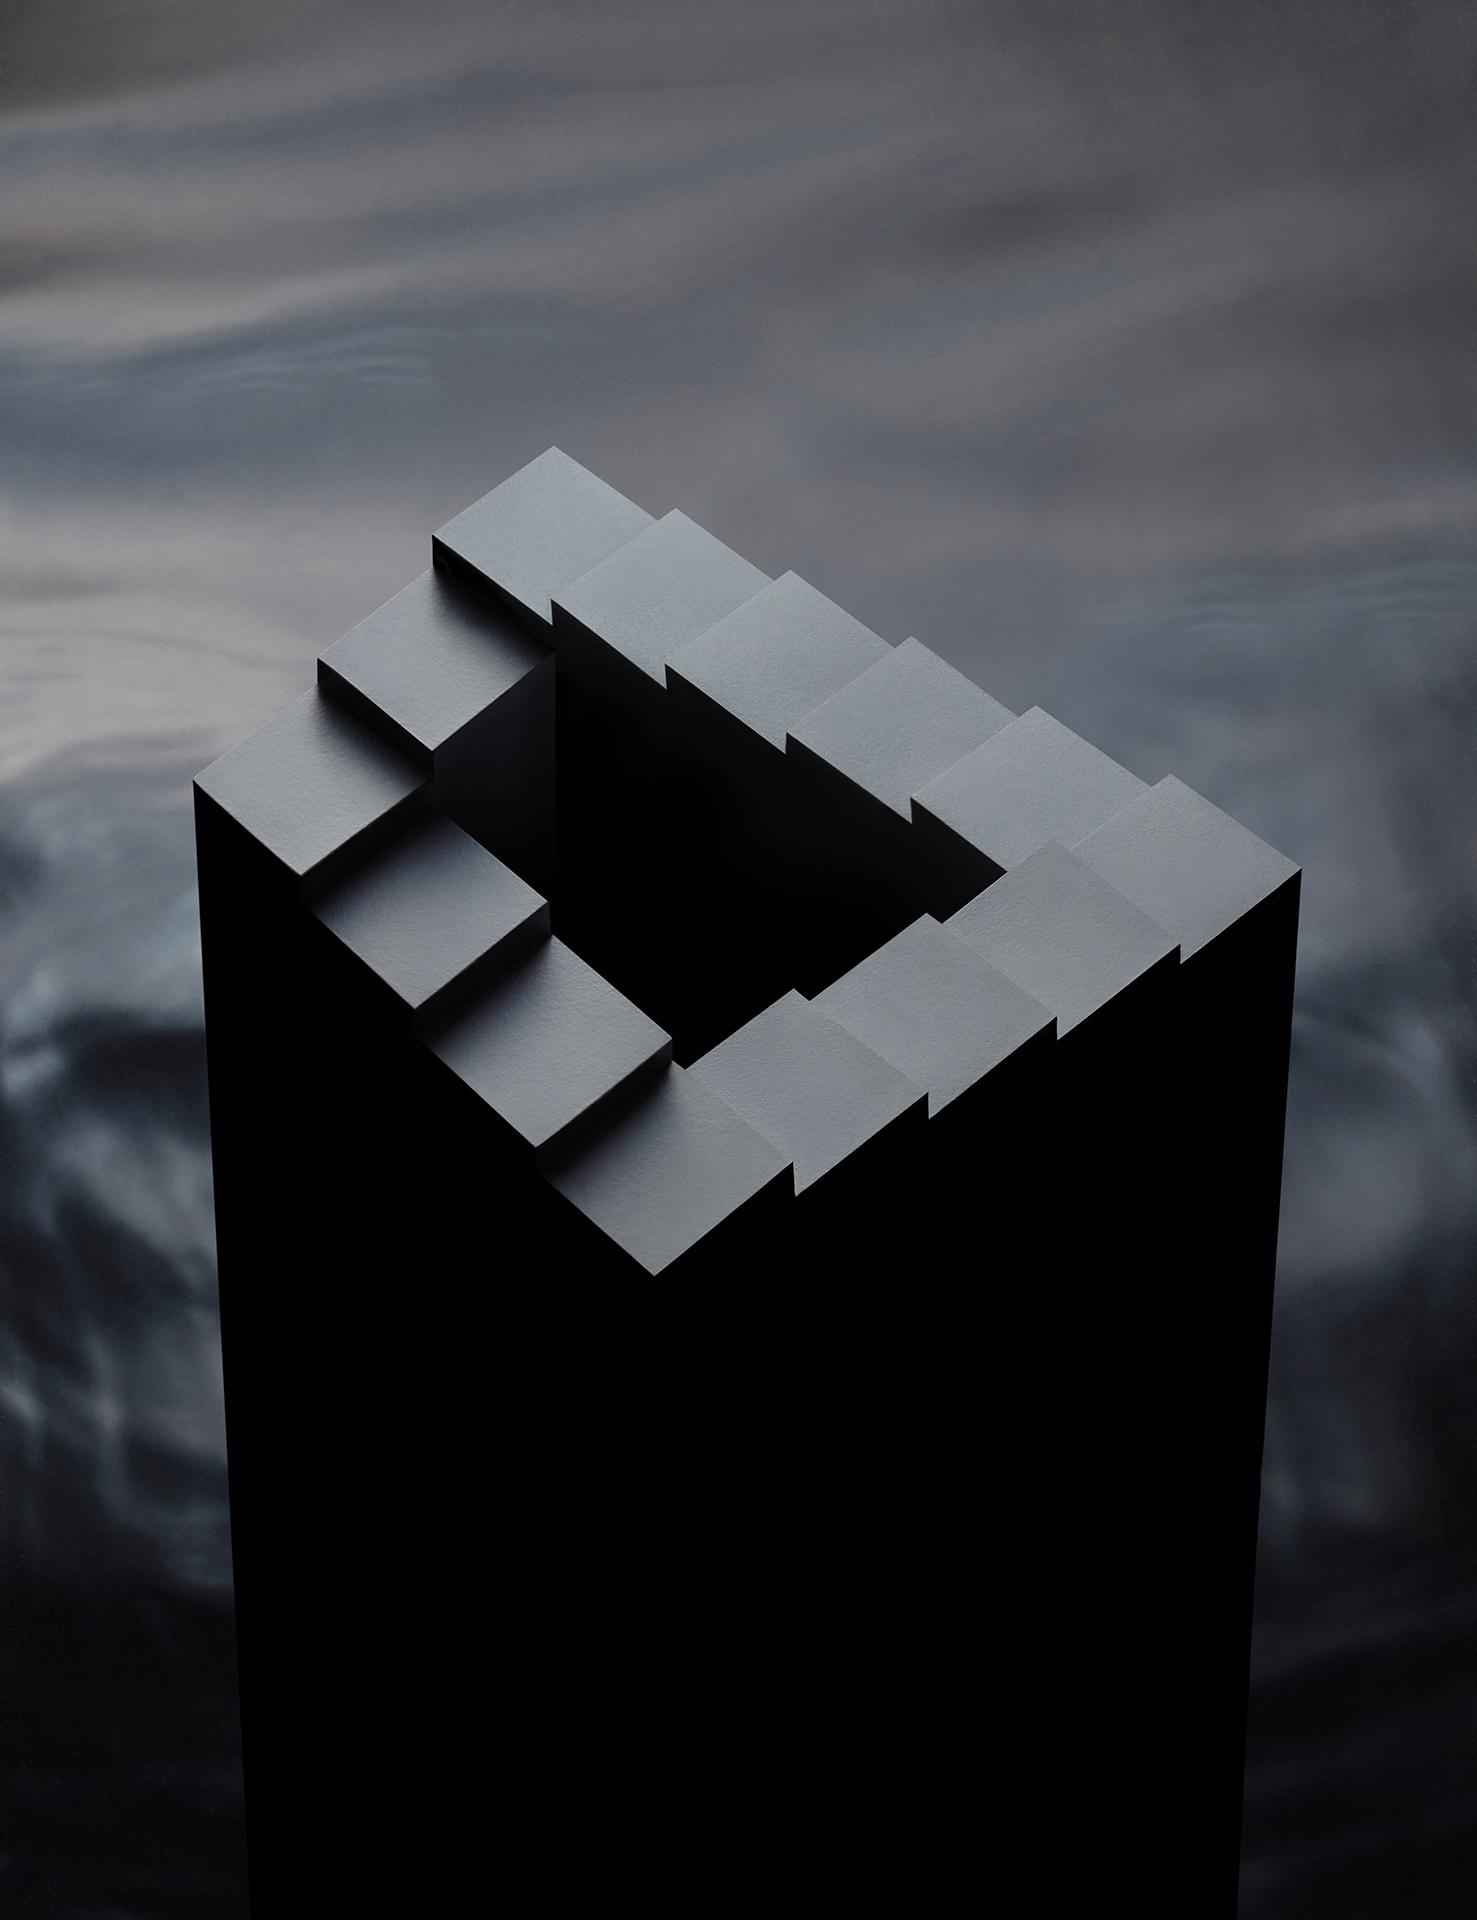 escher-impossible-shape-illusion-creative-still-life-photography-london-photographer-2